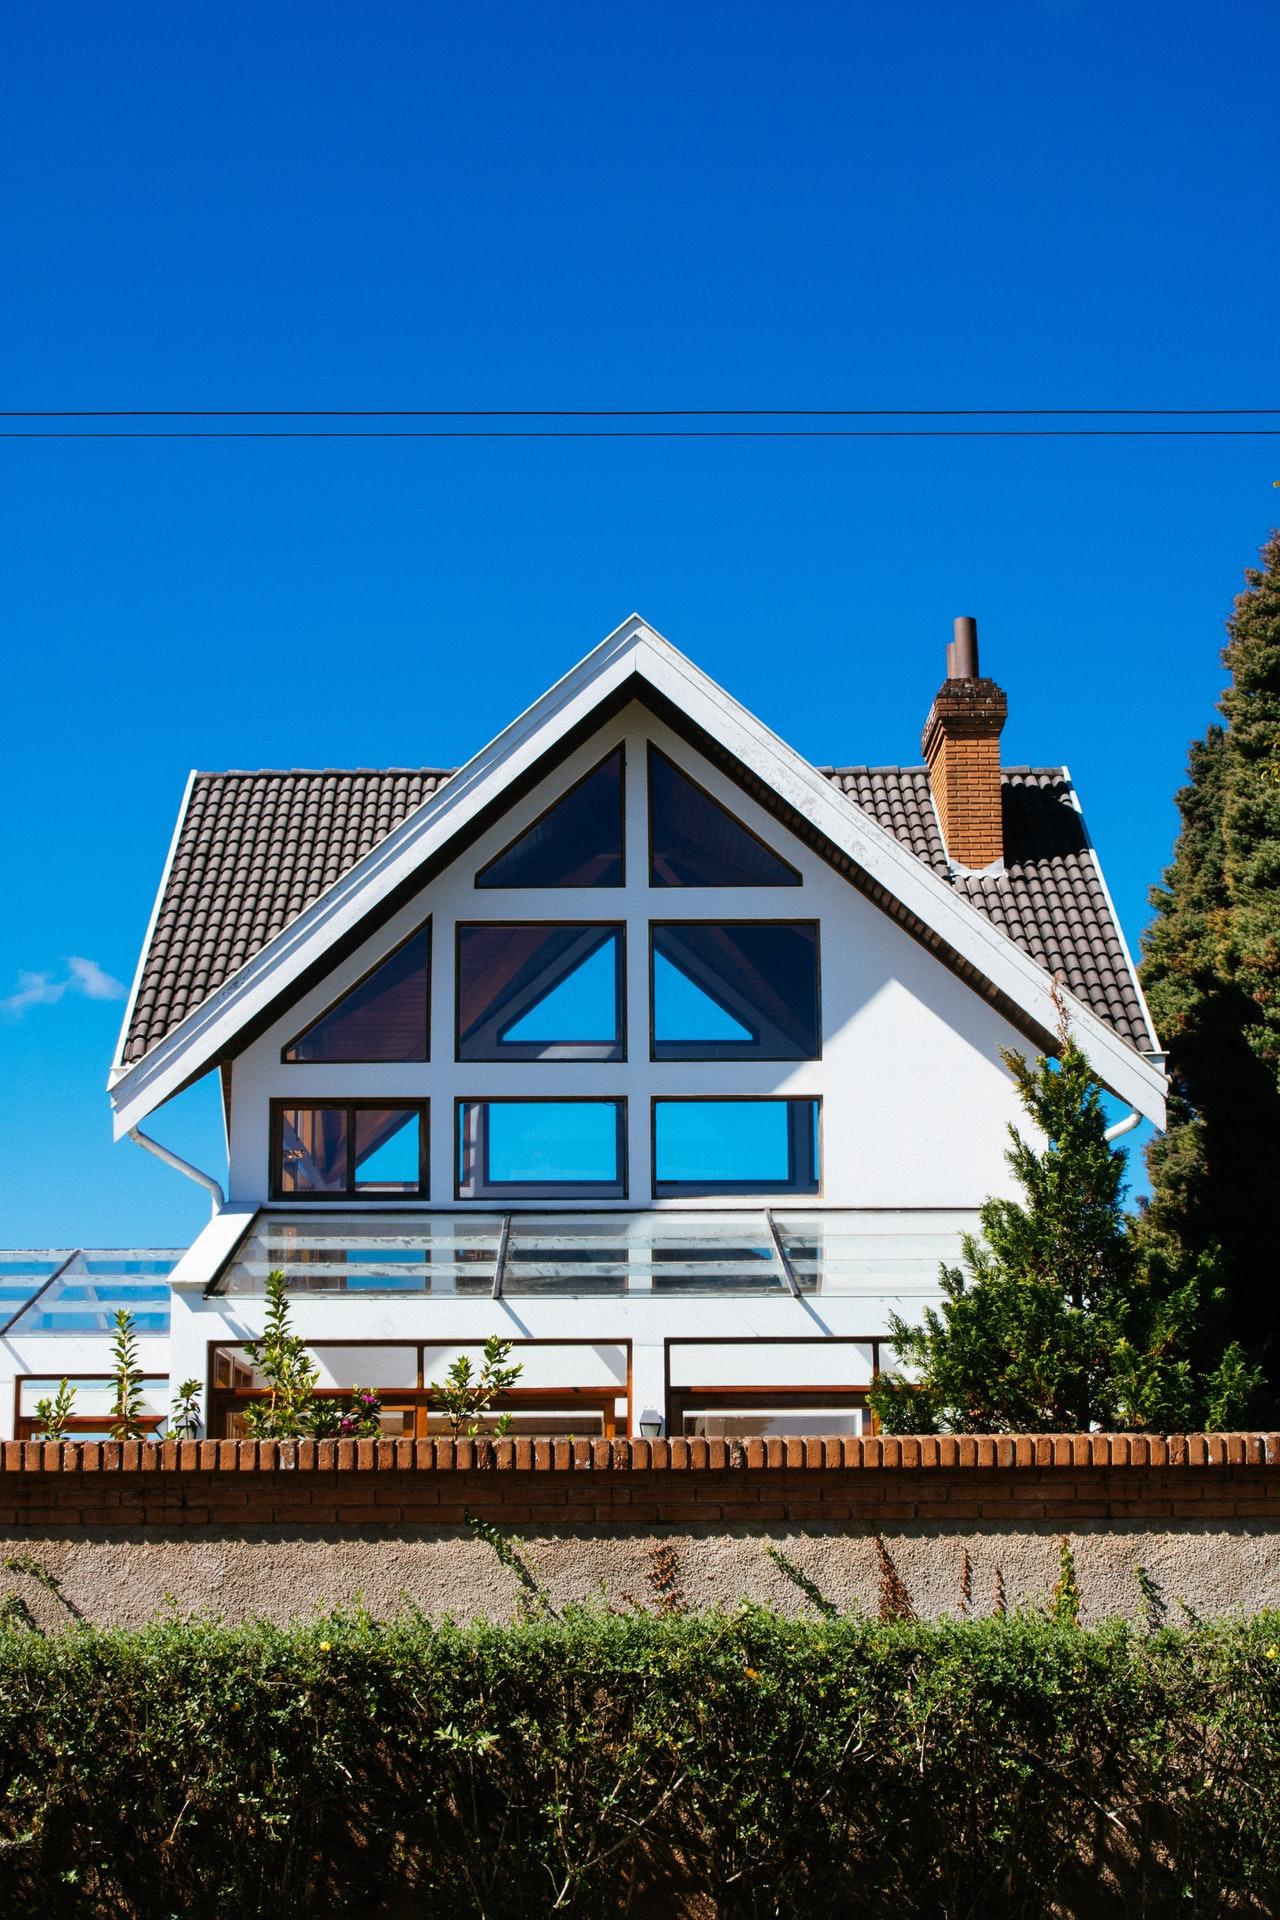 white-concrete-house-under-clear-blue-sky-2371975